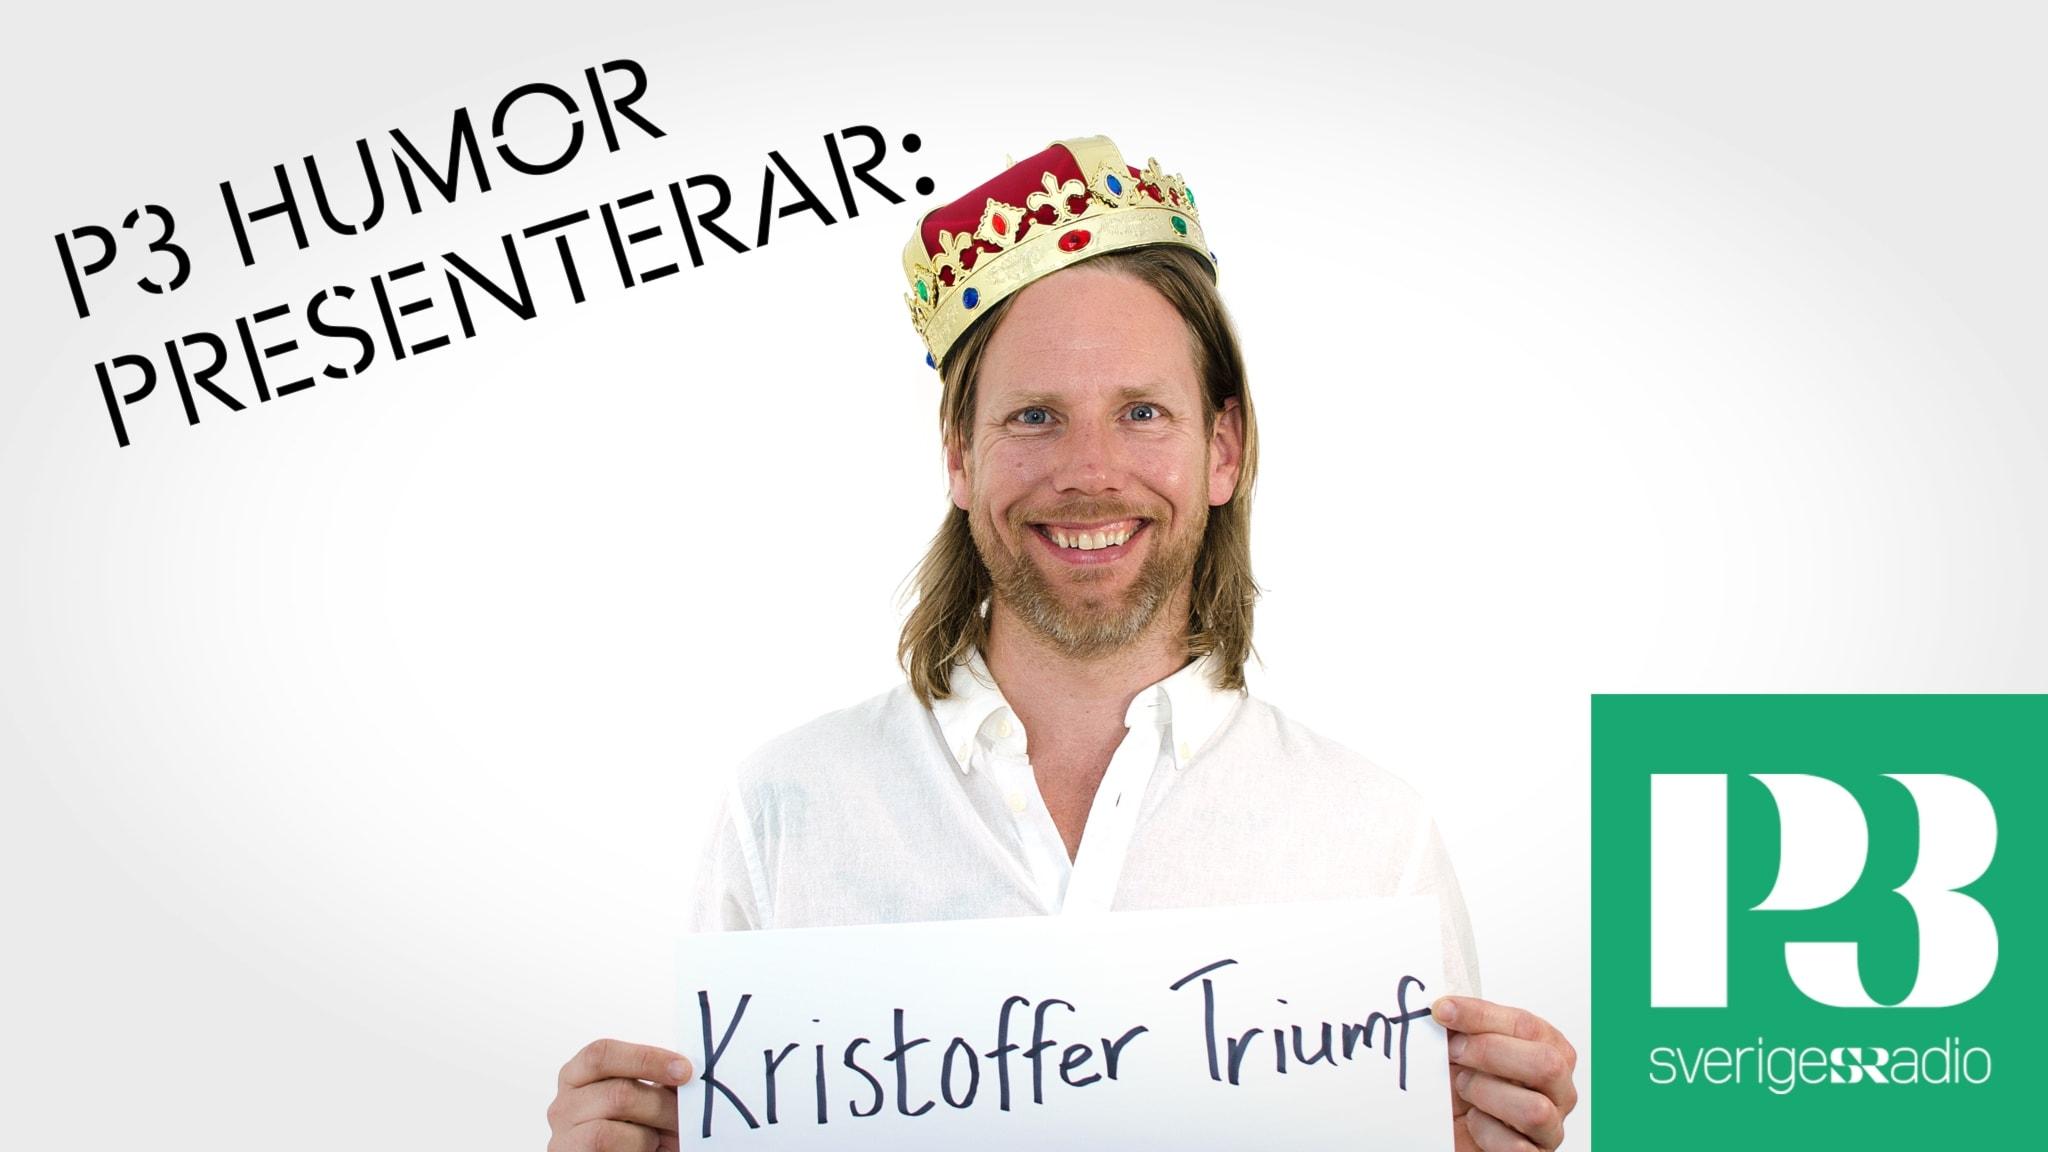 P3 Humor presenterar: Kristoffer Triumf